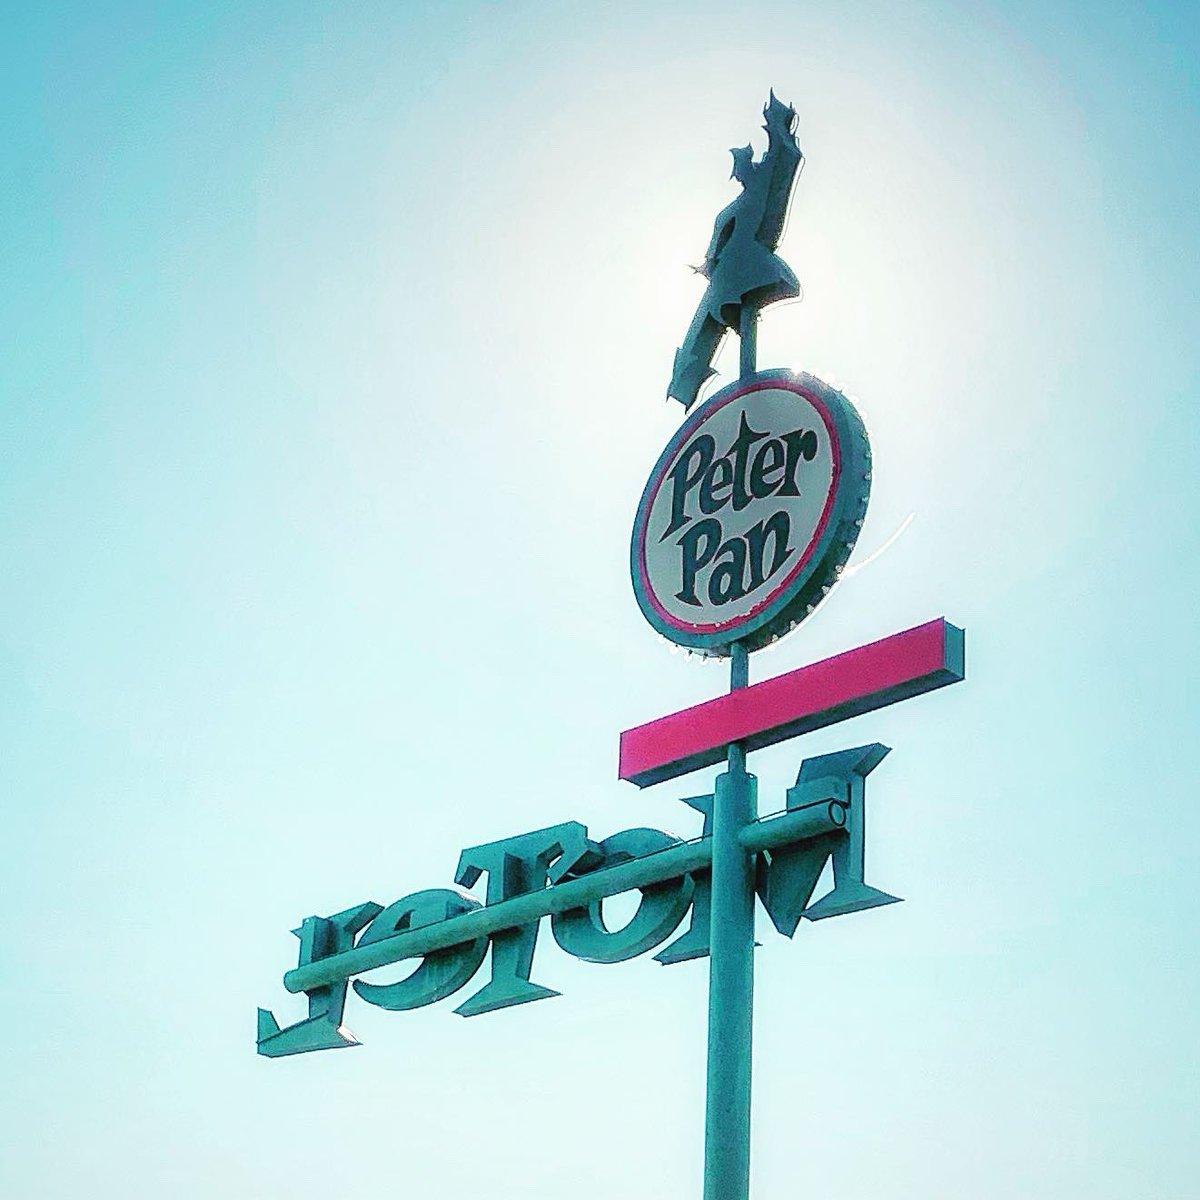 Peter Pan Motel, 1963, Las Vegas, NM , RIP Tony Hsieh https://t.co/3tzfOhFM8L